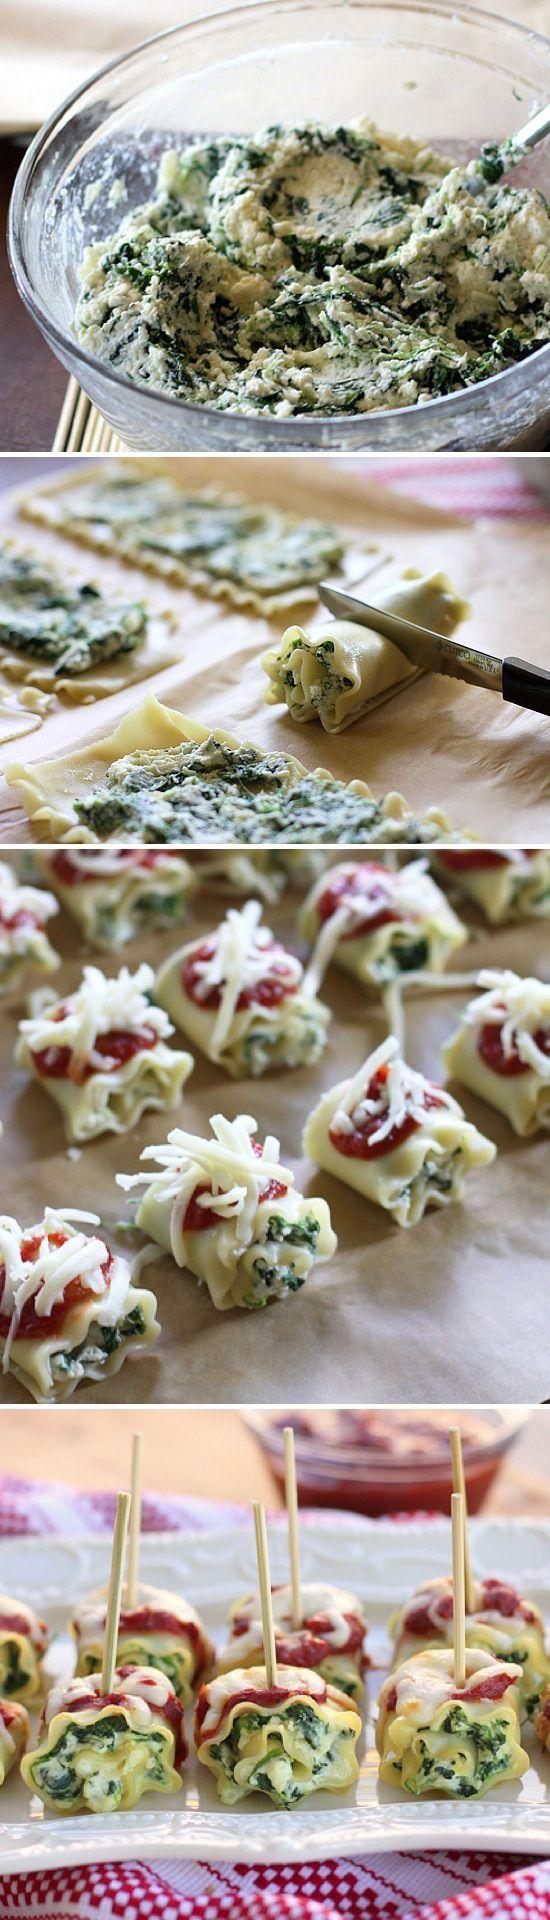 Mini Spinach Lasagna Roll-Ups | Recipe By Photo